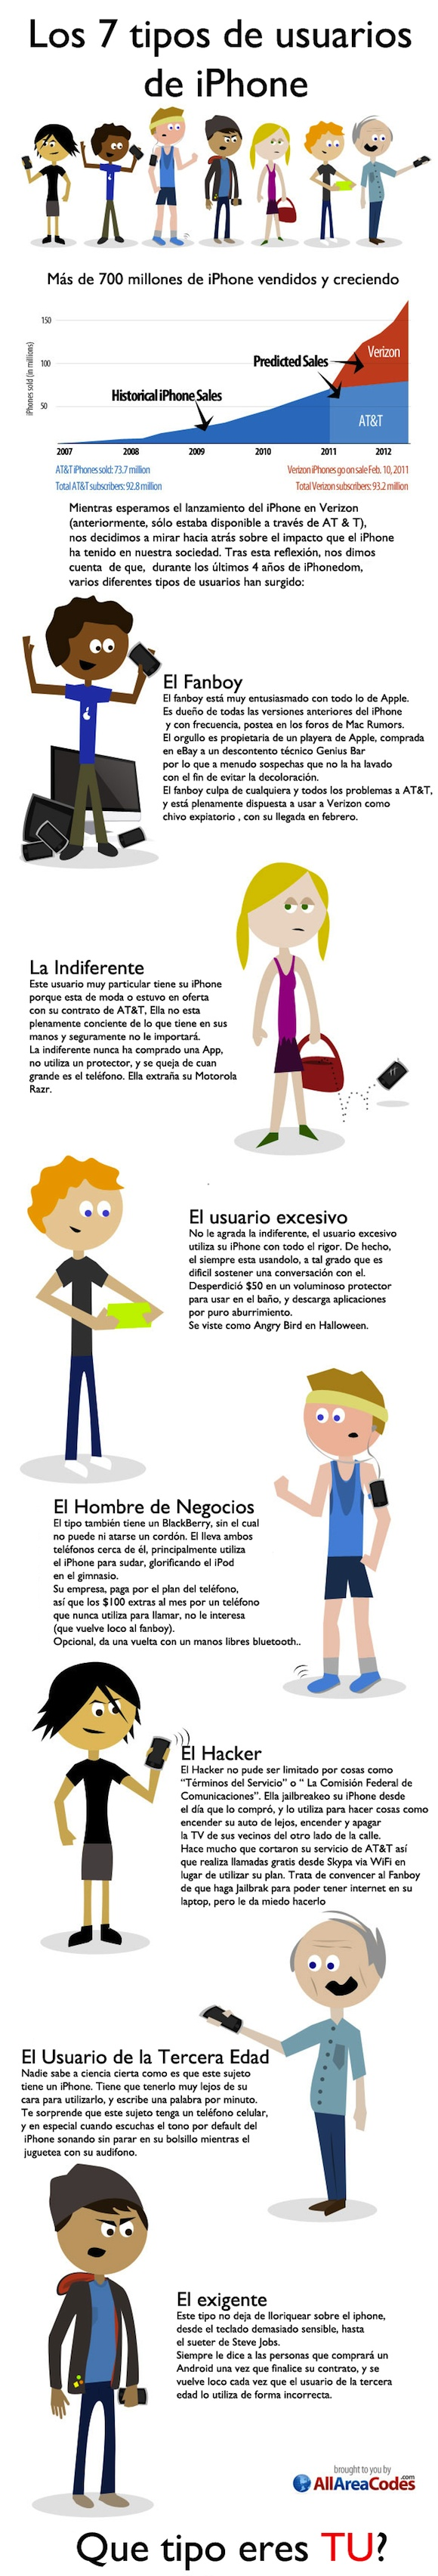 Los 7 tipos de usuarios del iPhone #infografia